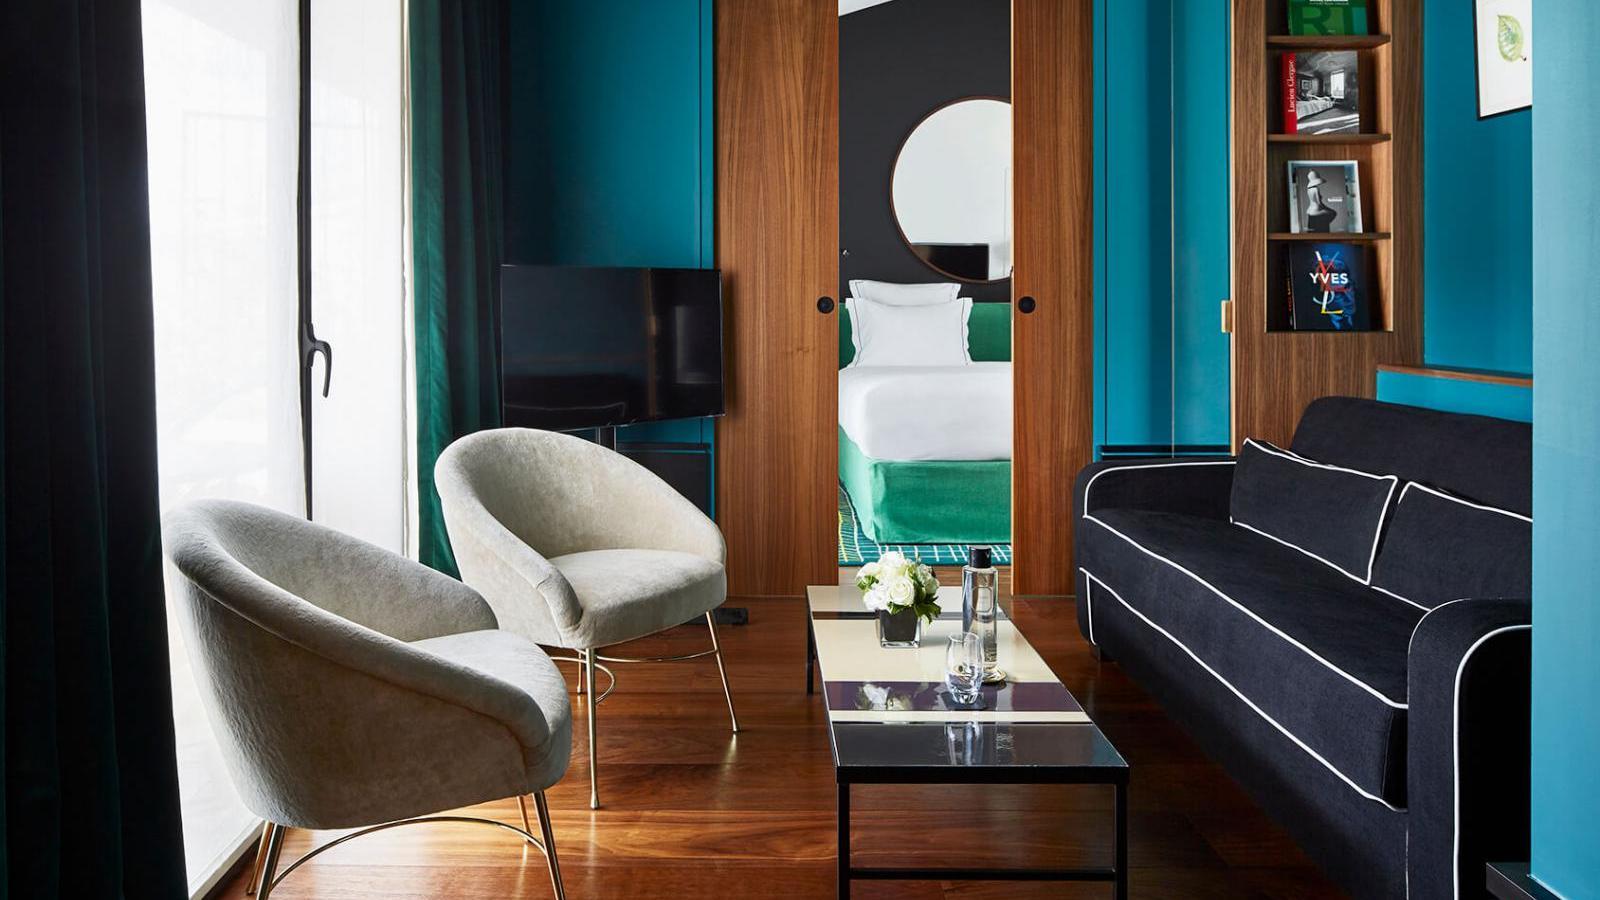 Le Roch Hotel & Spa unveils its prestigious suite